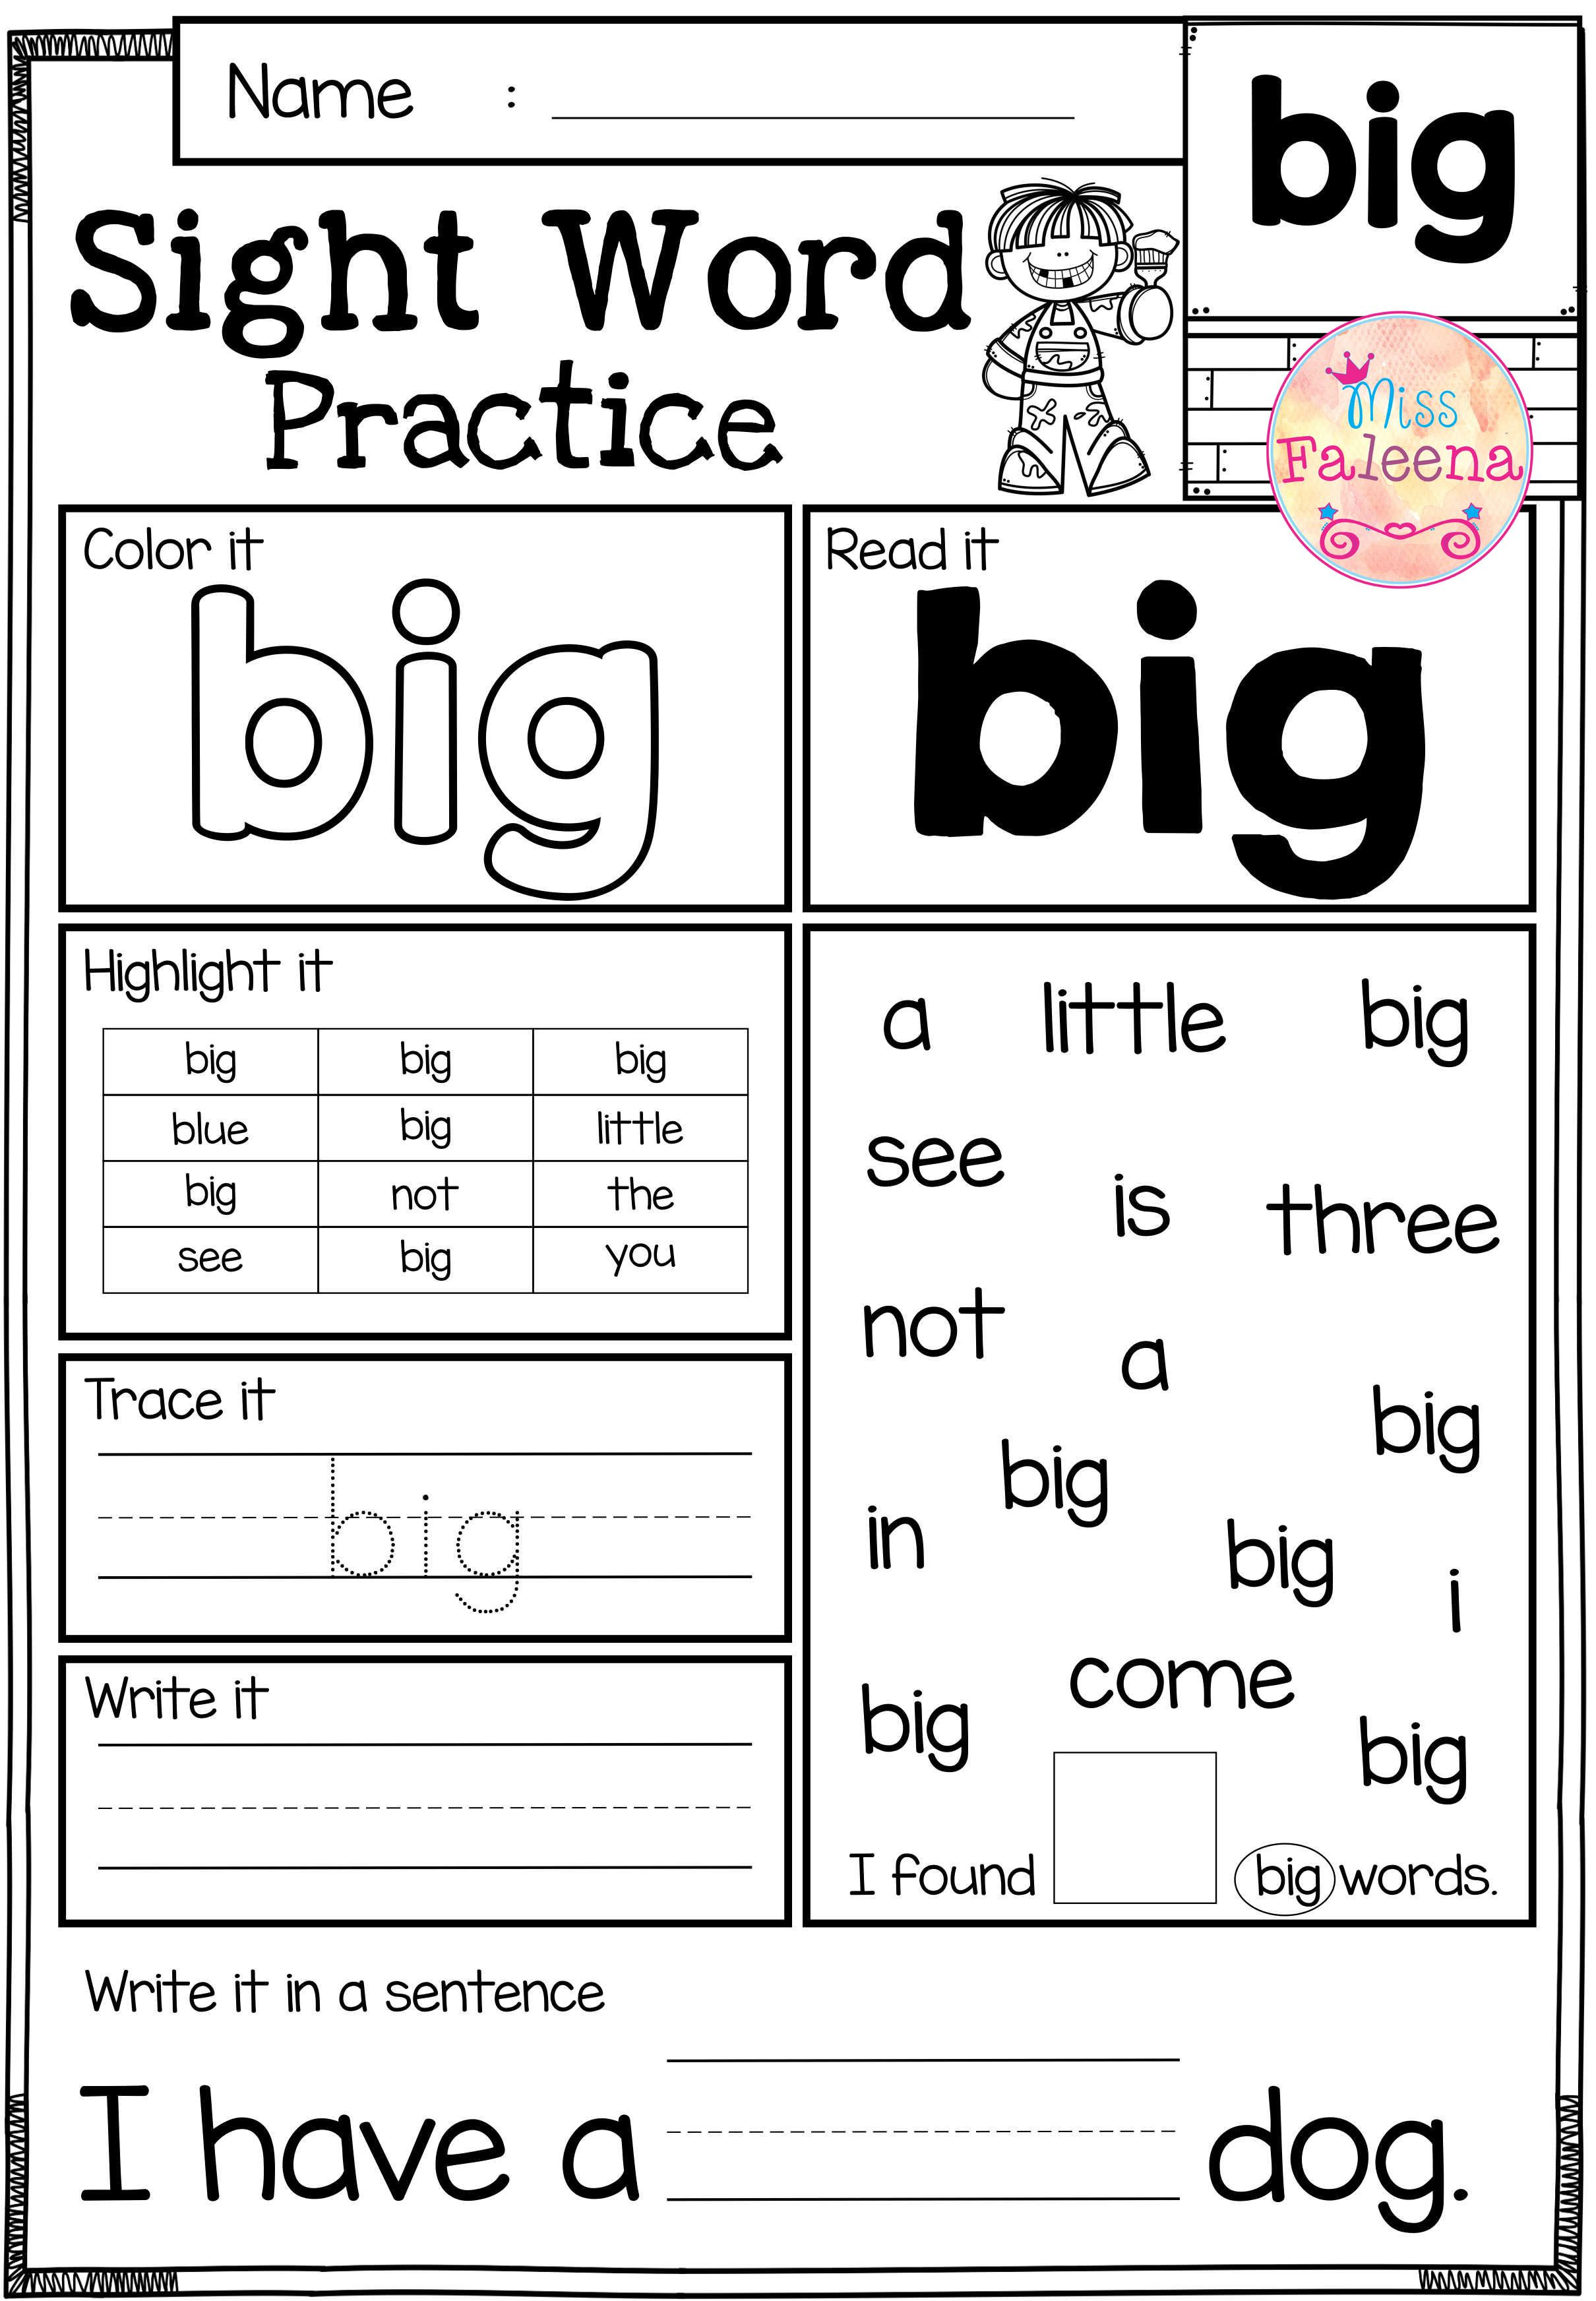 Sight Word Practice Pre Primer